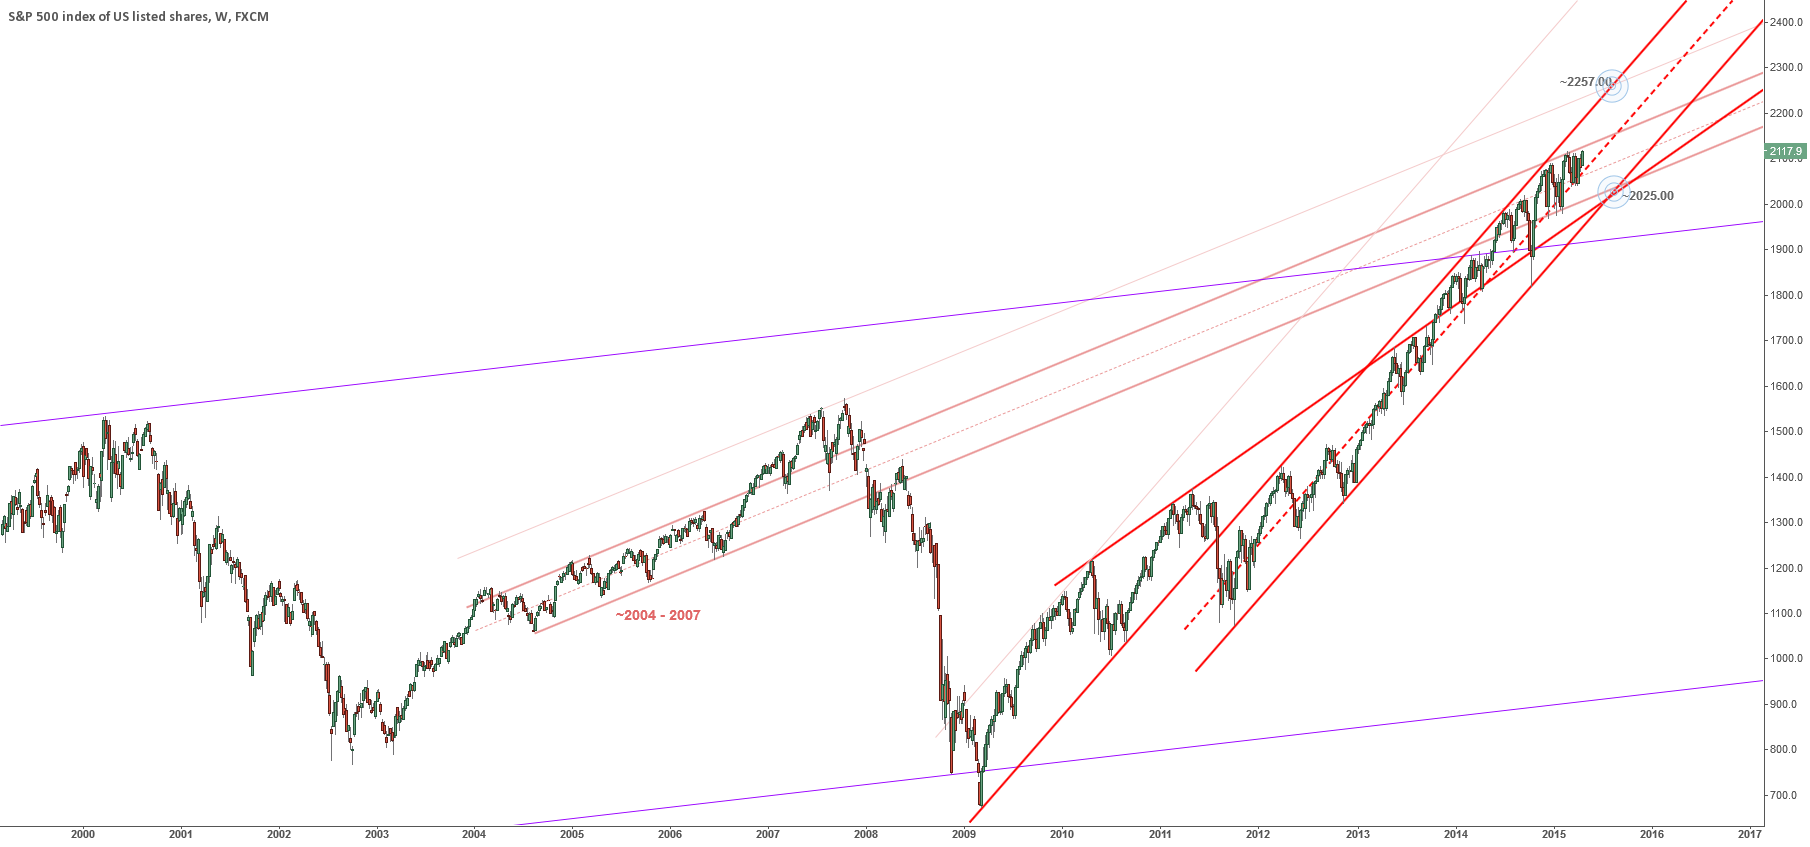 S&P Controlling Channels